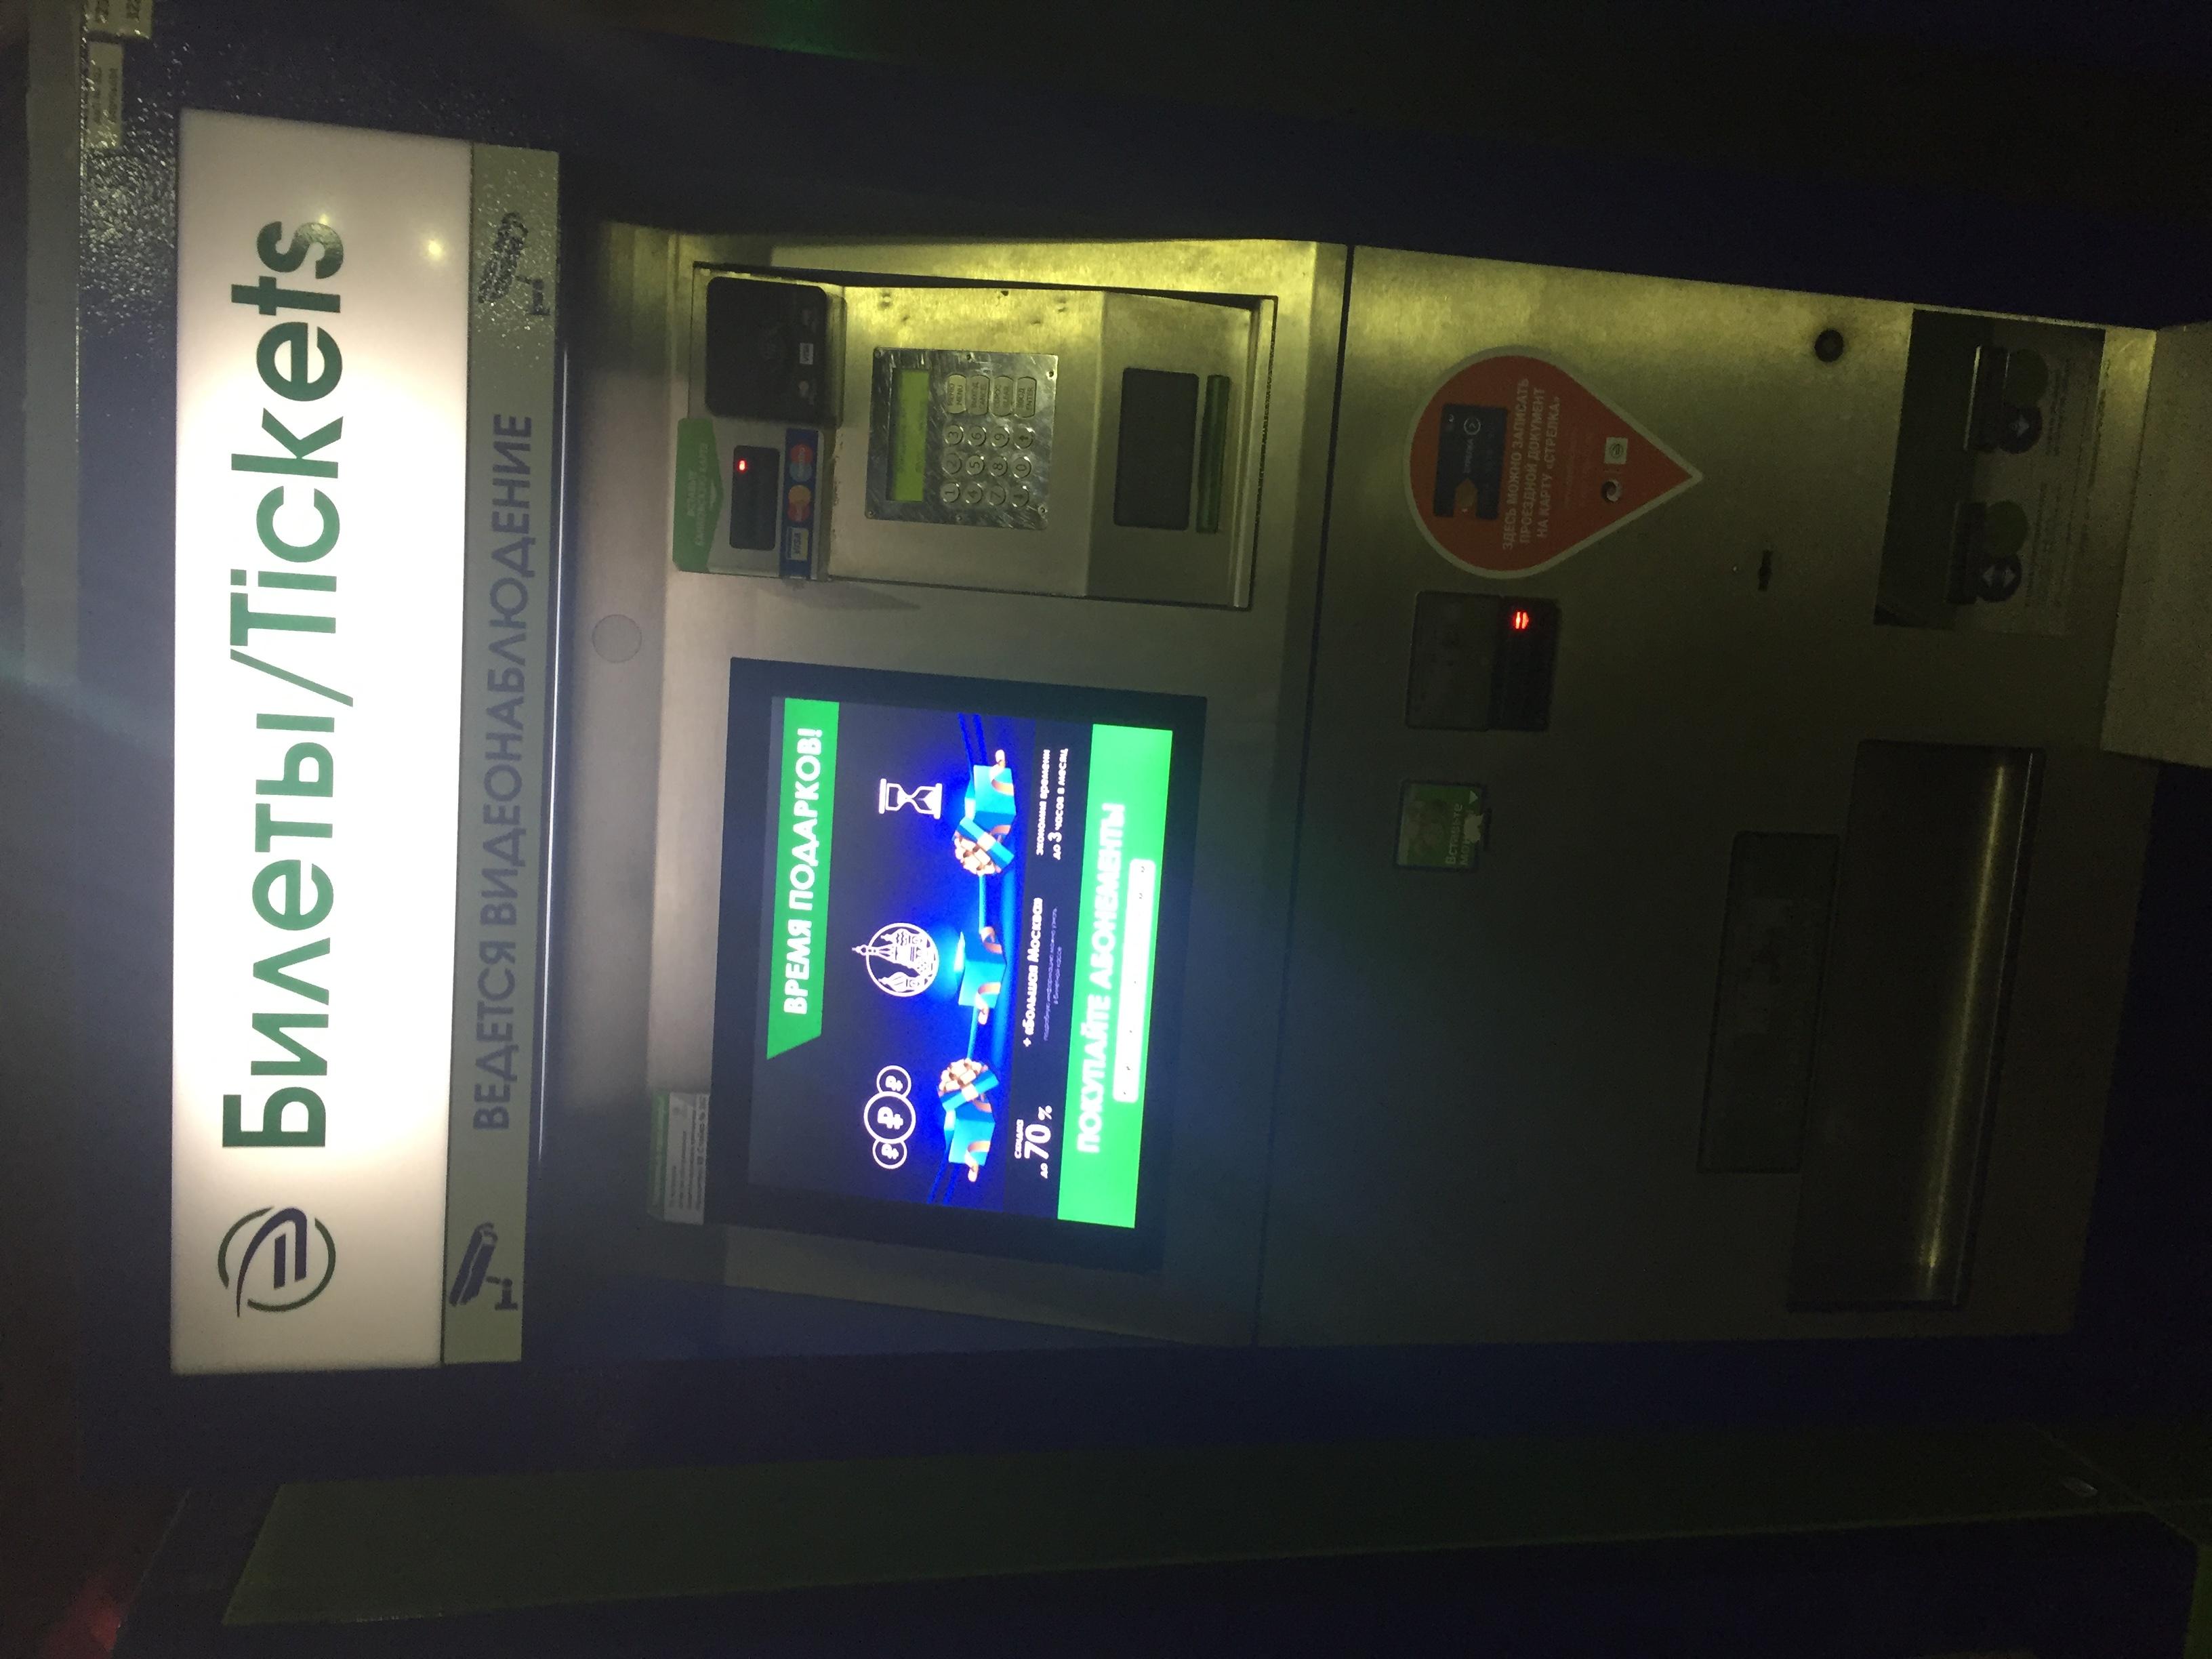 Покупка билета на электричку в аэропорт Домодедово